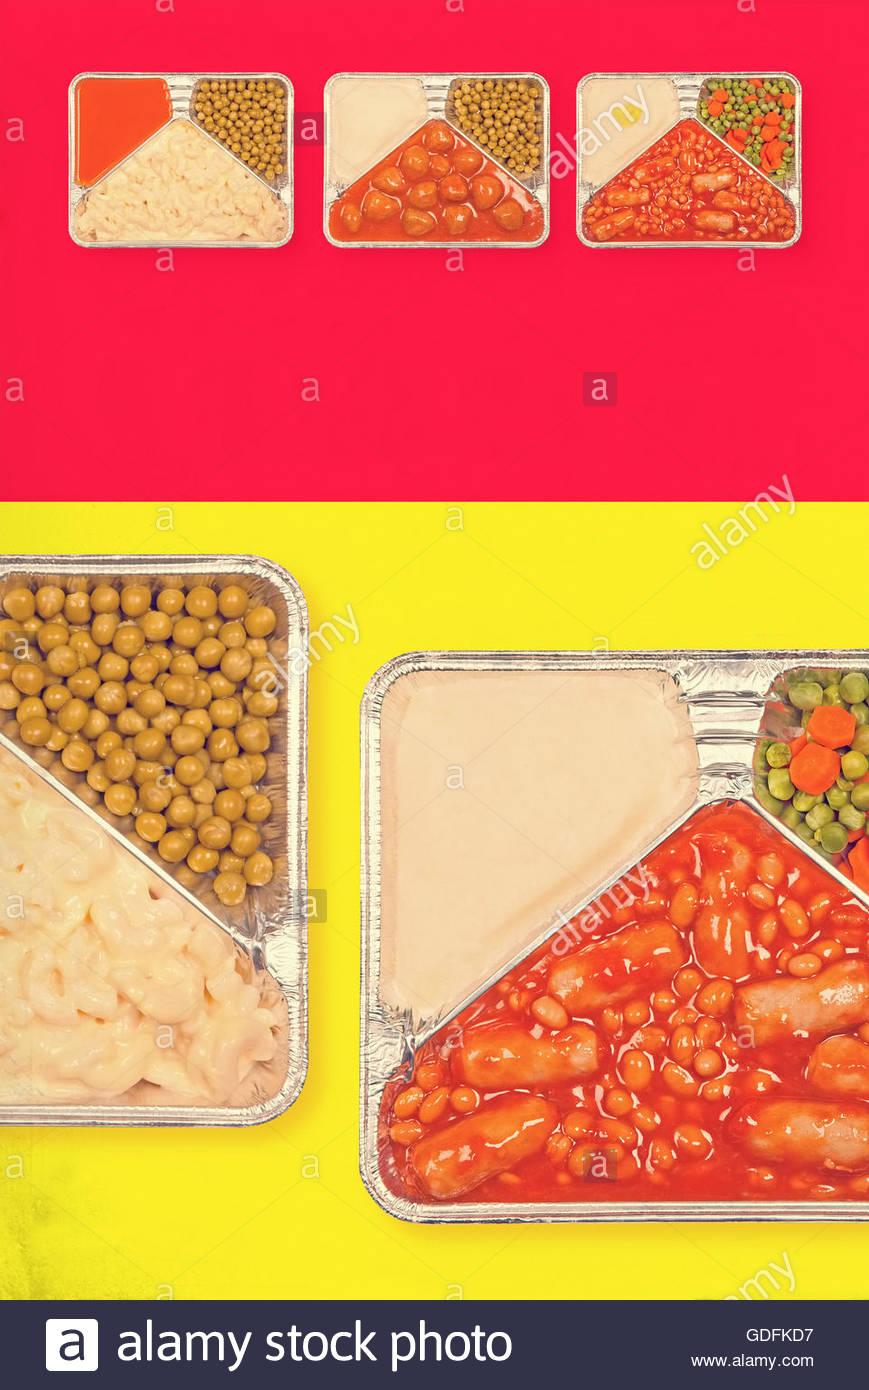 TV dinner tray vintage retro advert meal aluminium food dishes - Stock Image